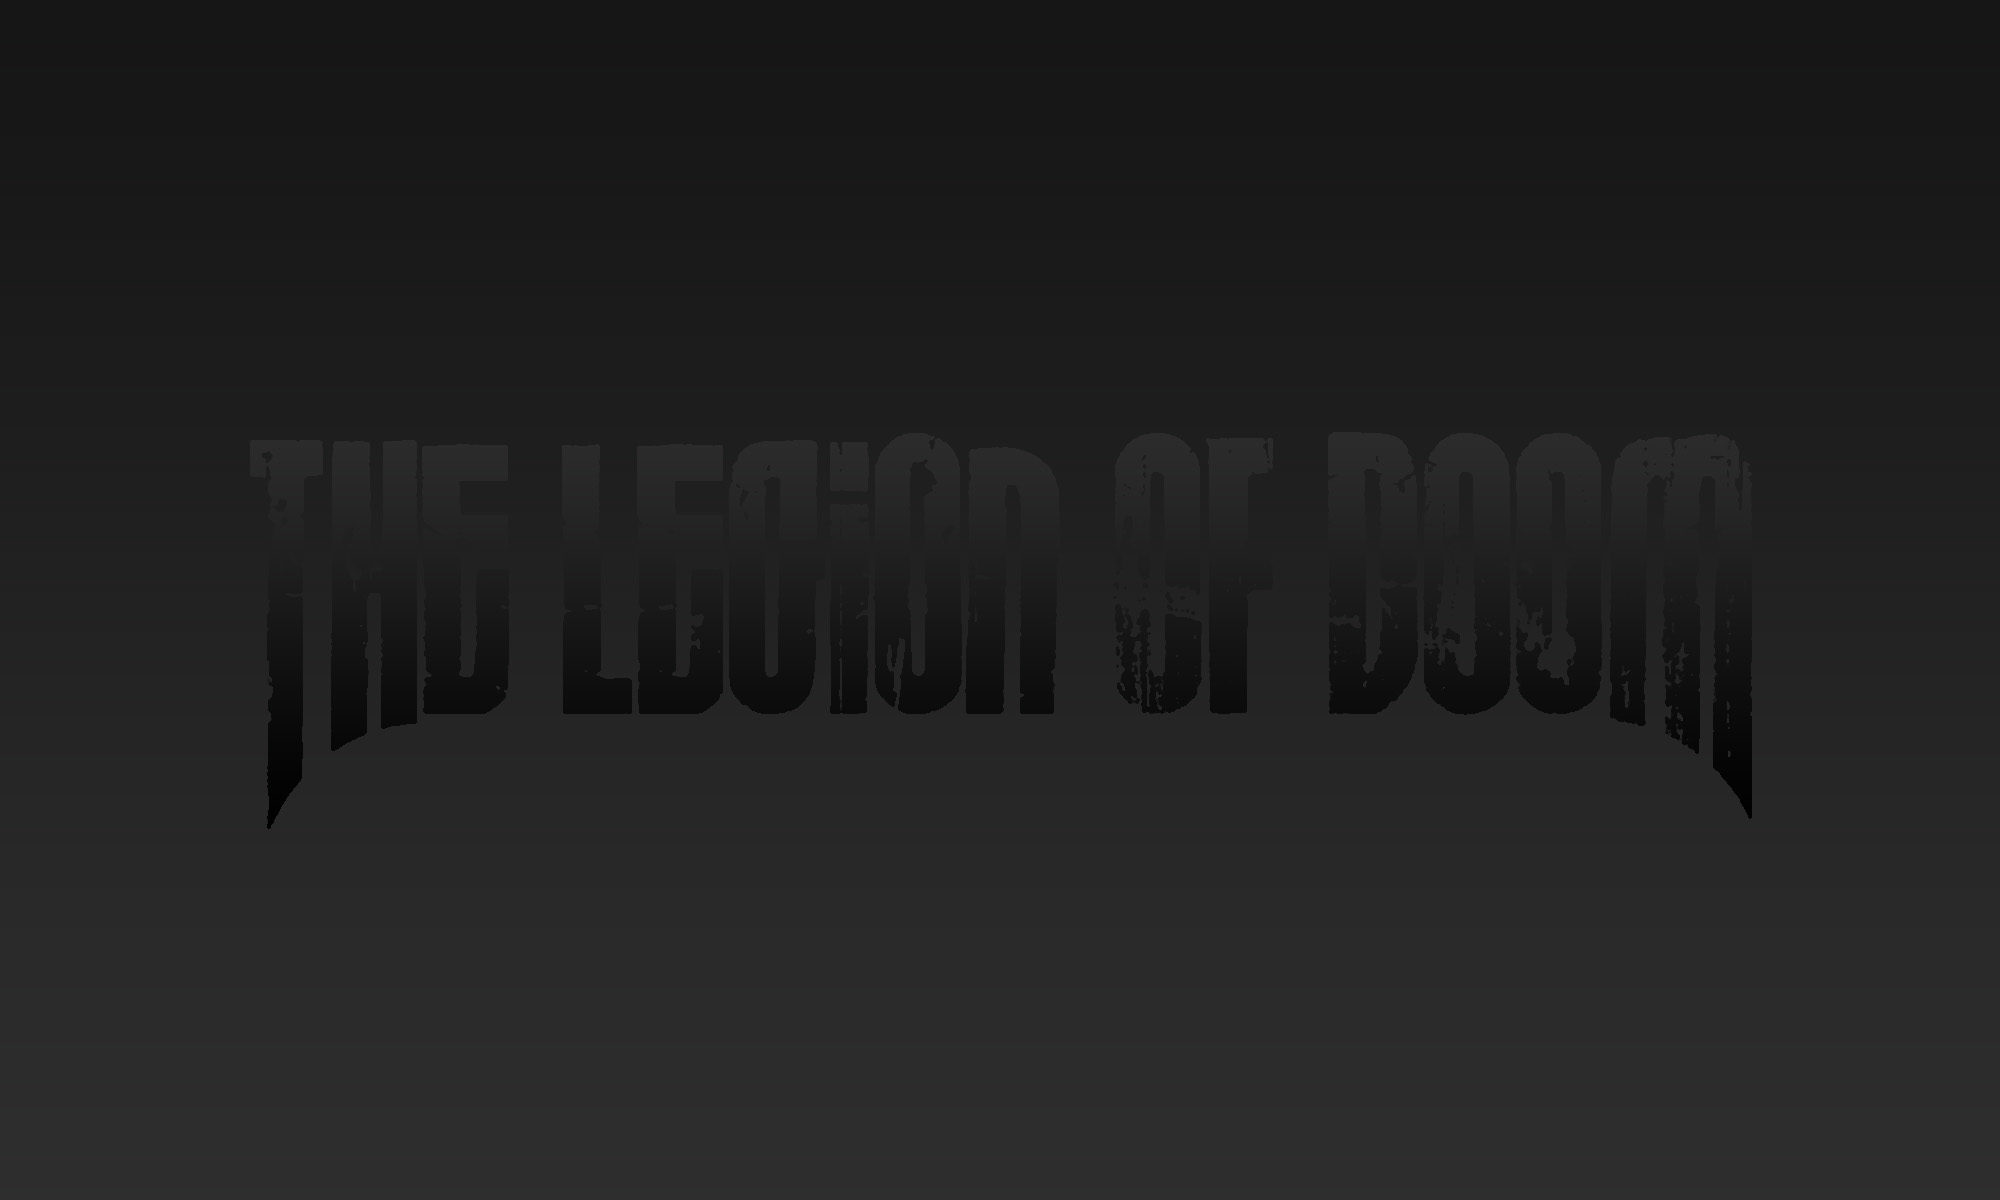 The Legion of Doom